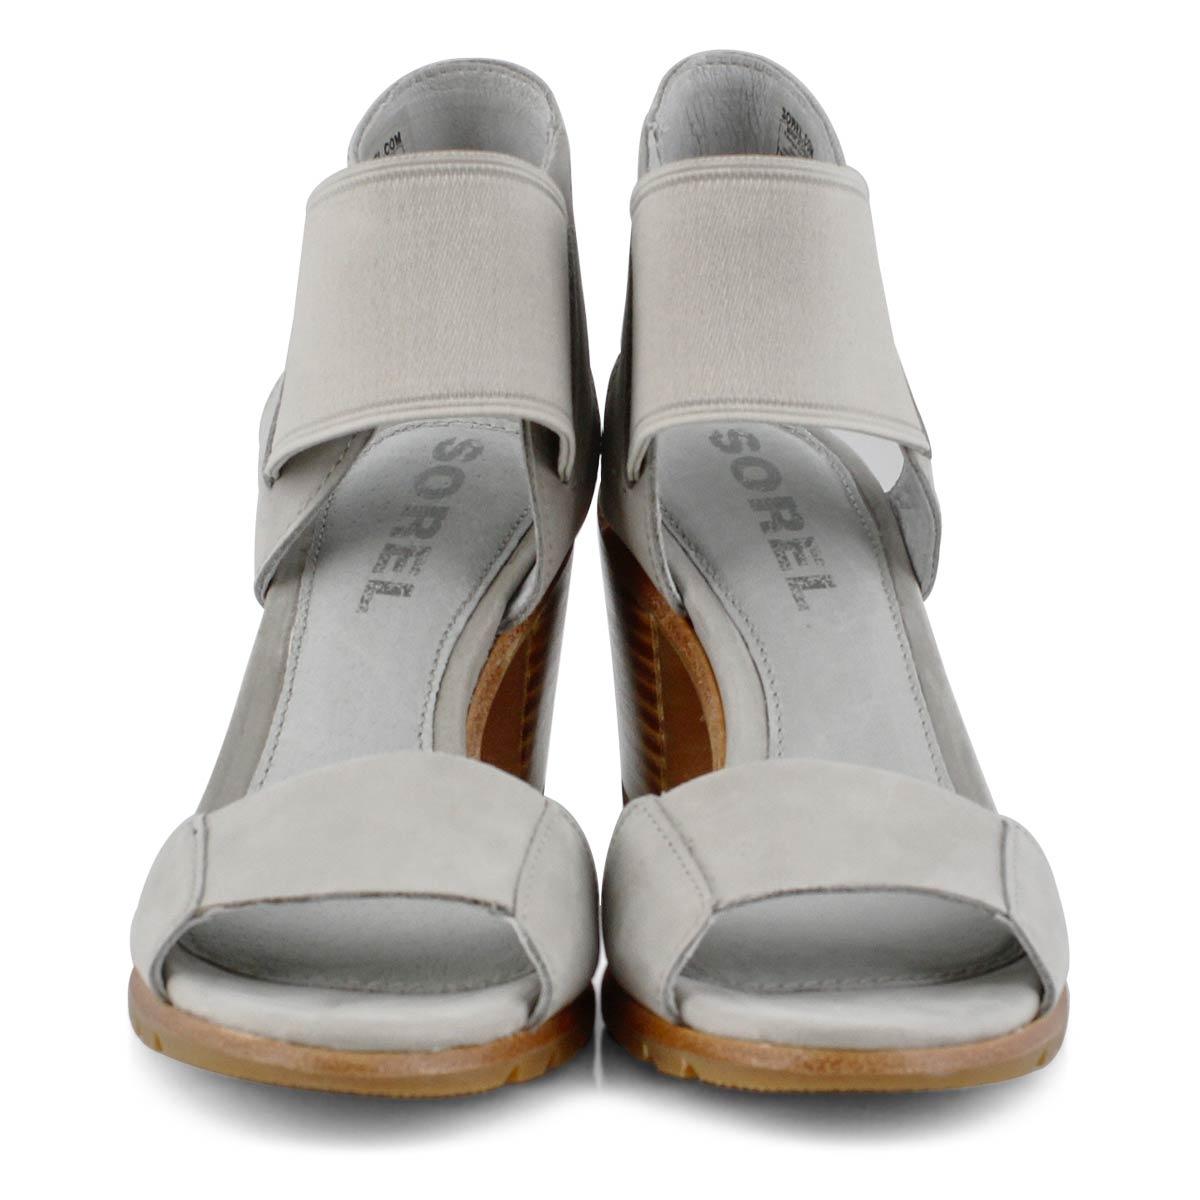 Sandales habillées NADIA, gris perle, femmes